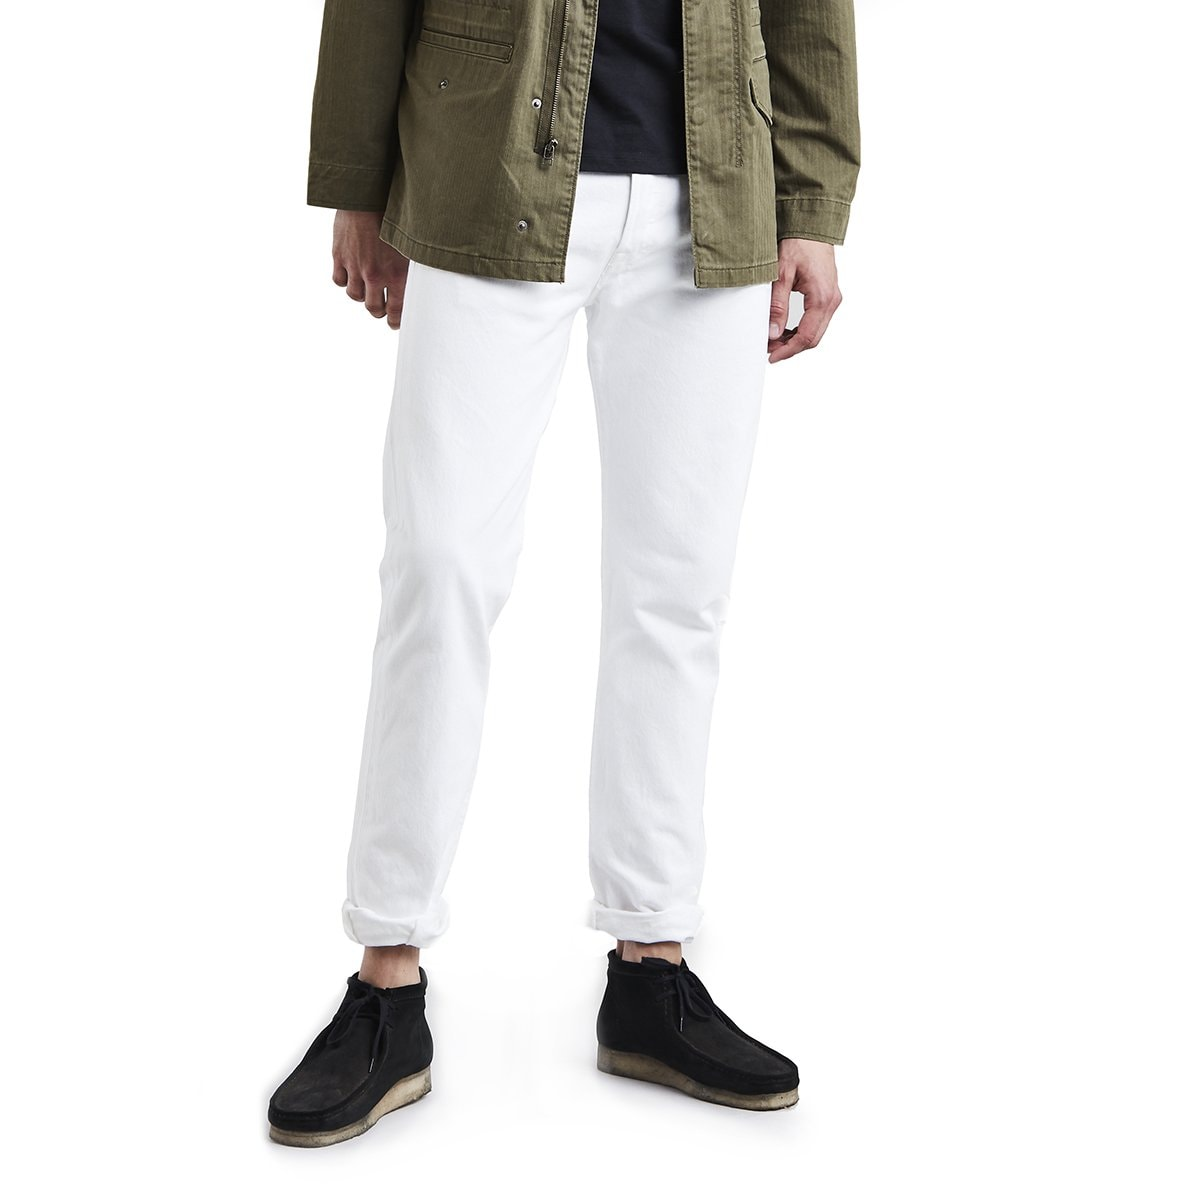 Jeans 501 Straight Levi's